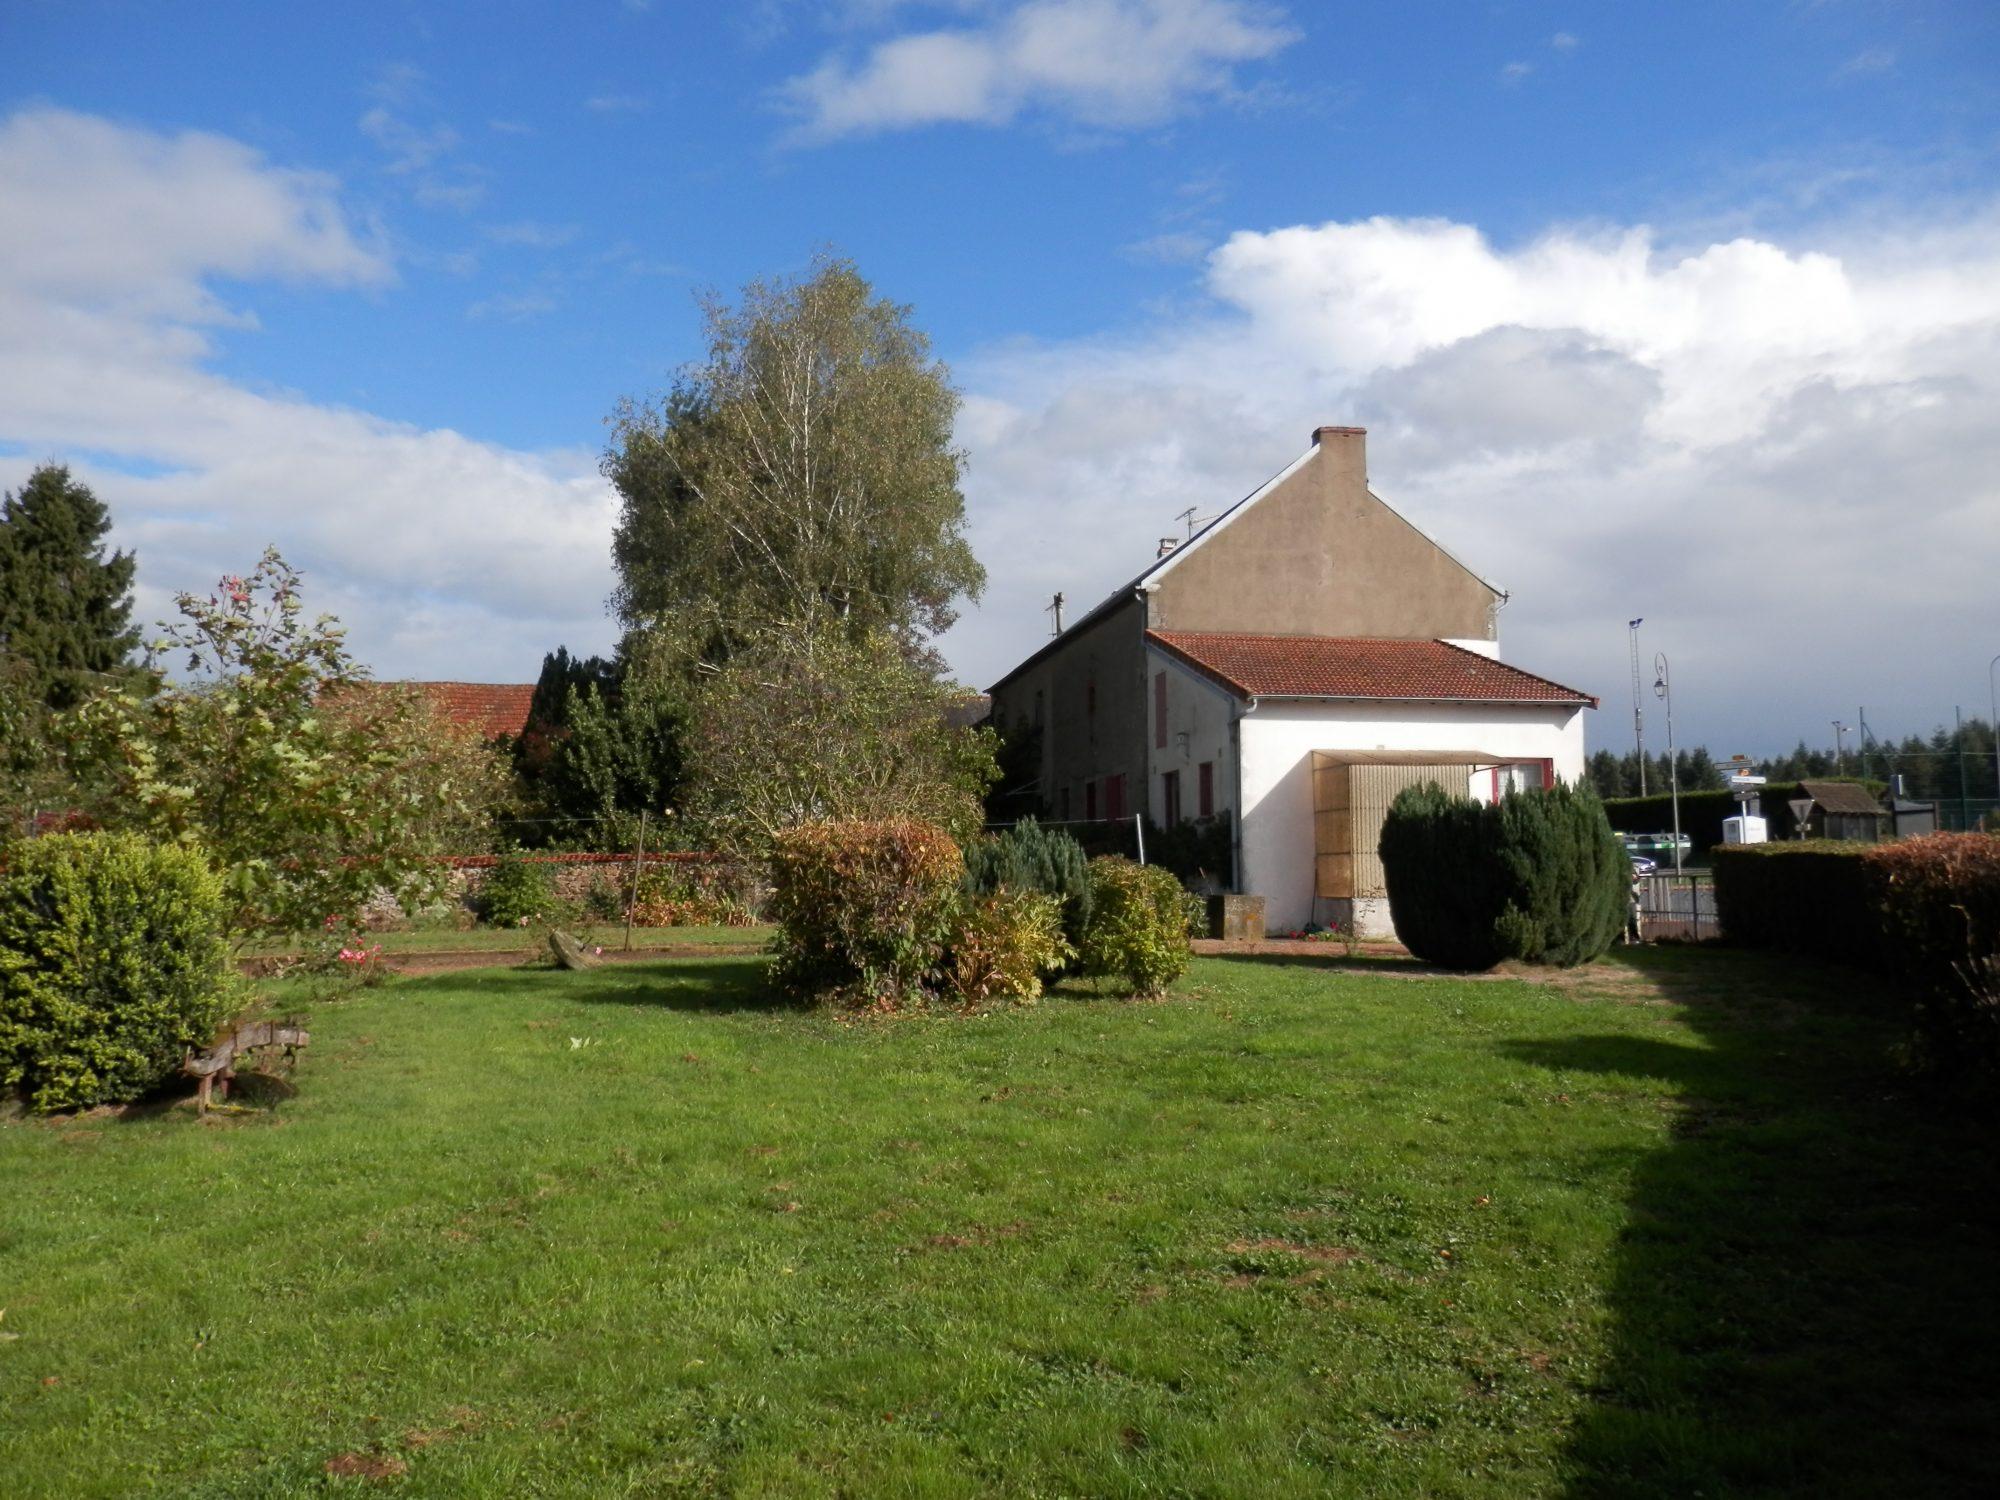 Belle maison avec son jardin terjat a la campagne for Jardin immobilier